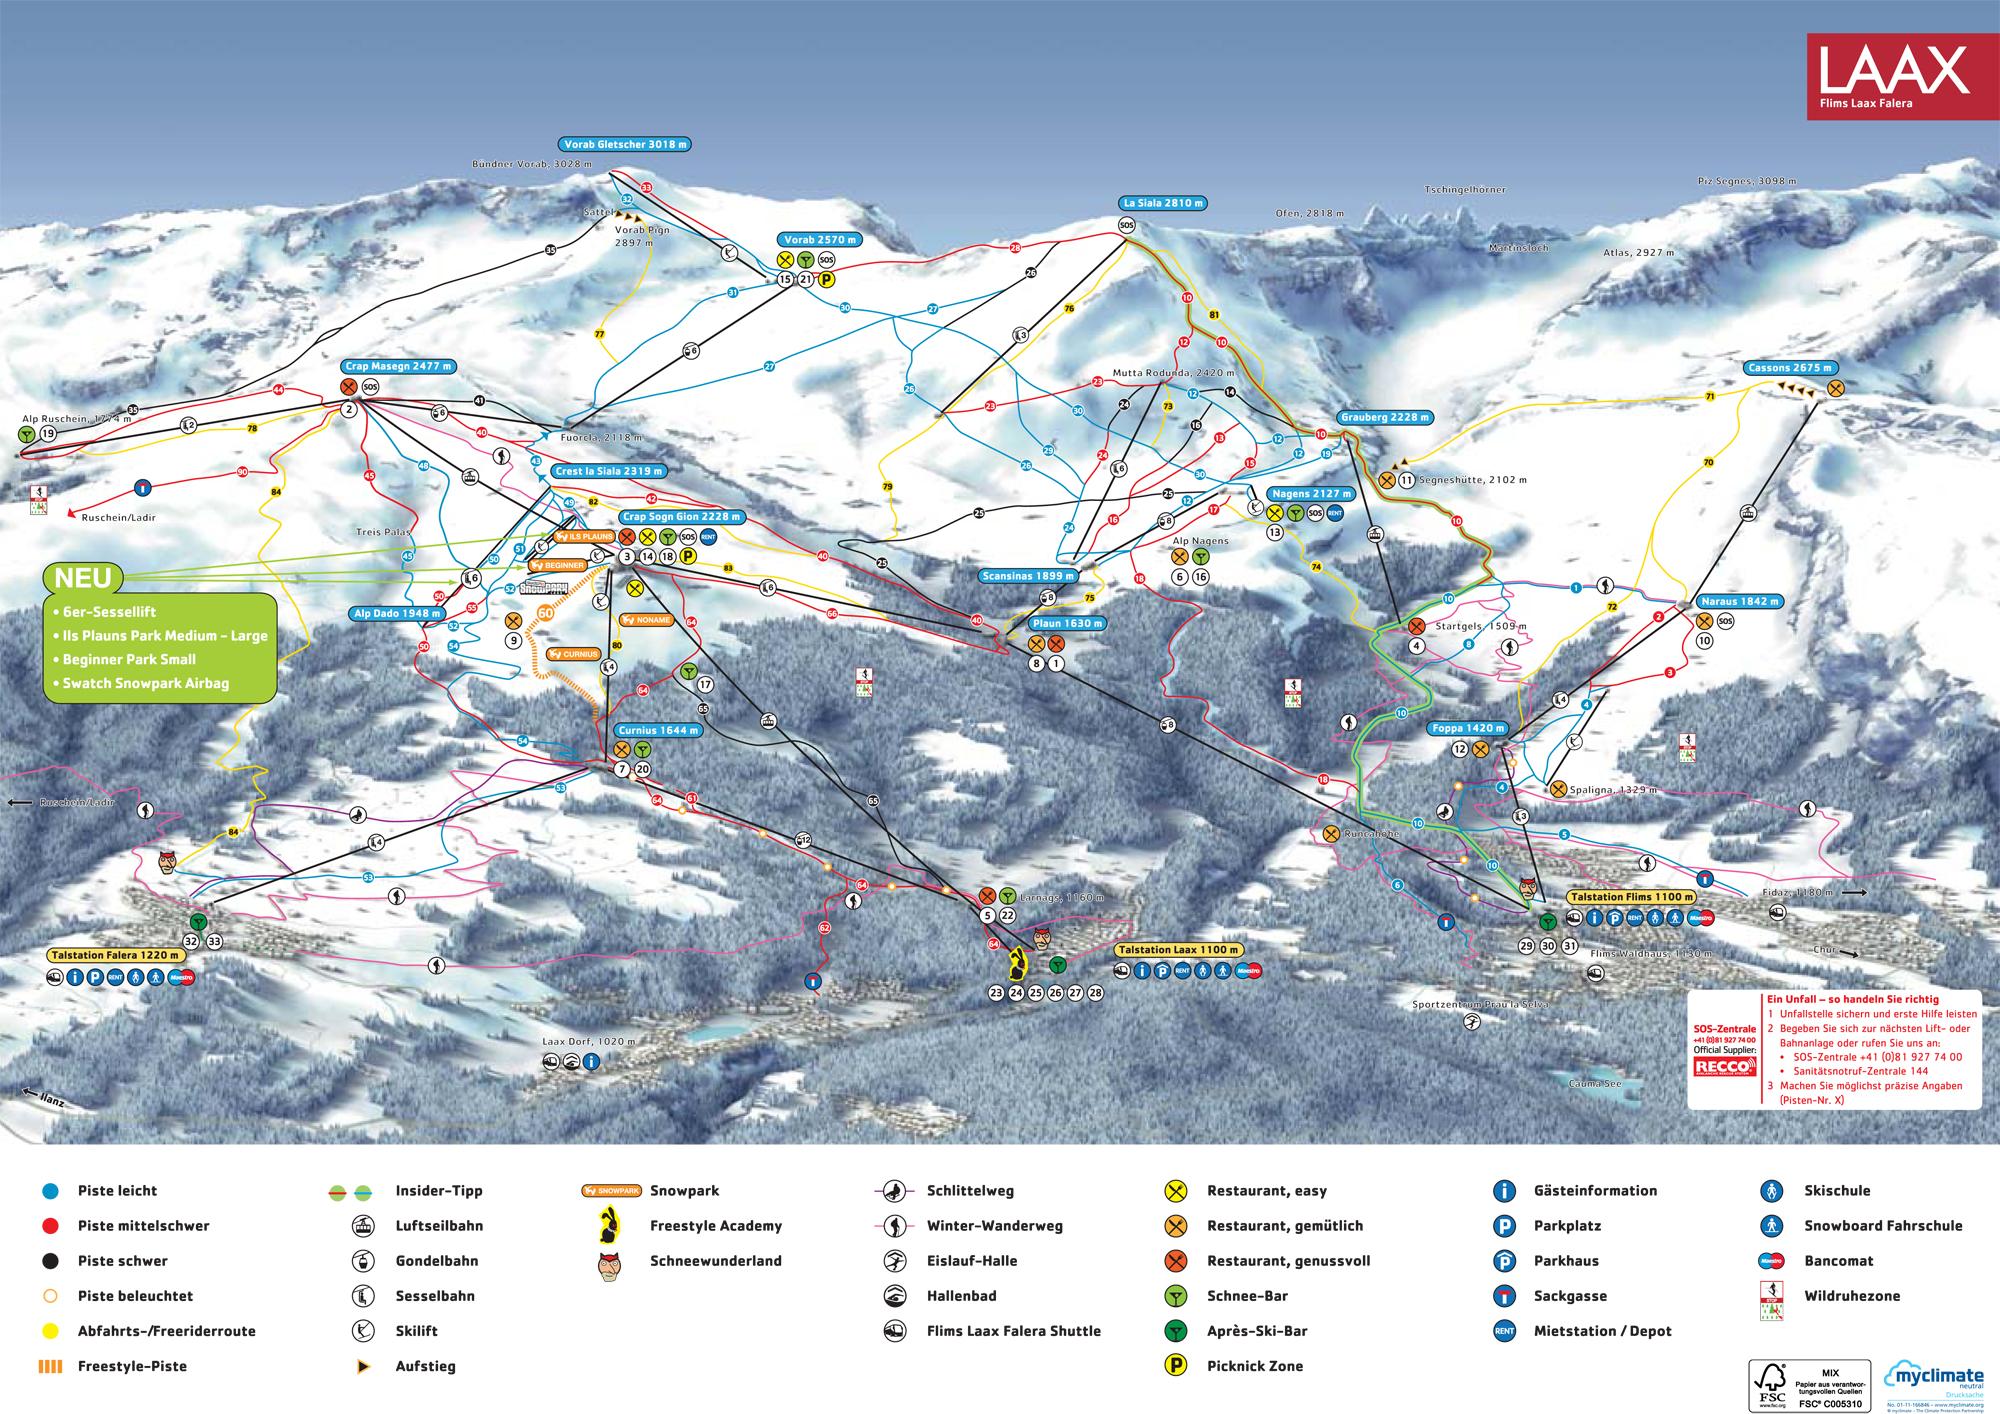 Ski Flims Laax Falera by train take the railway to ski or